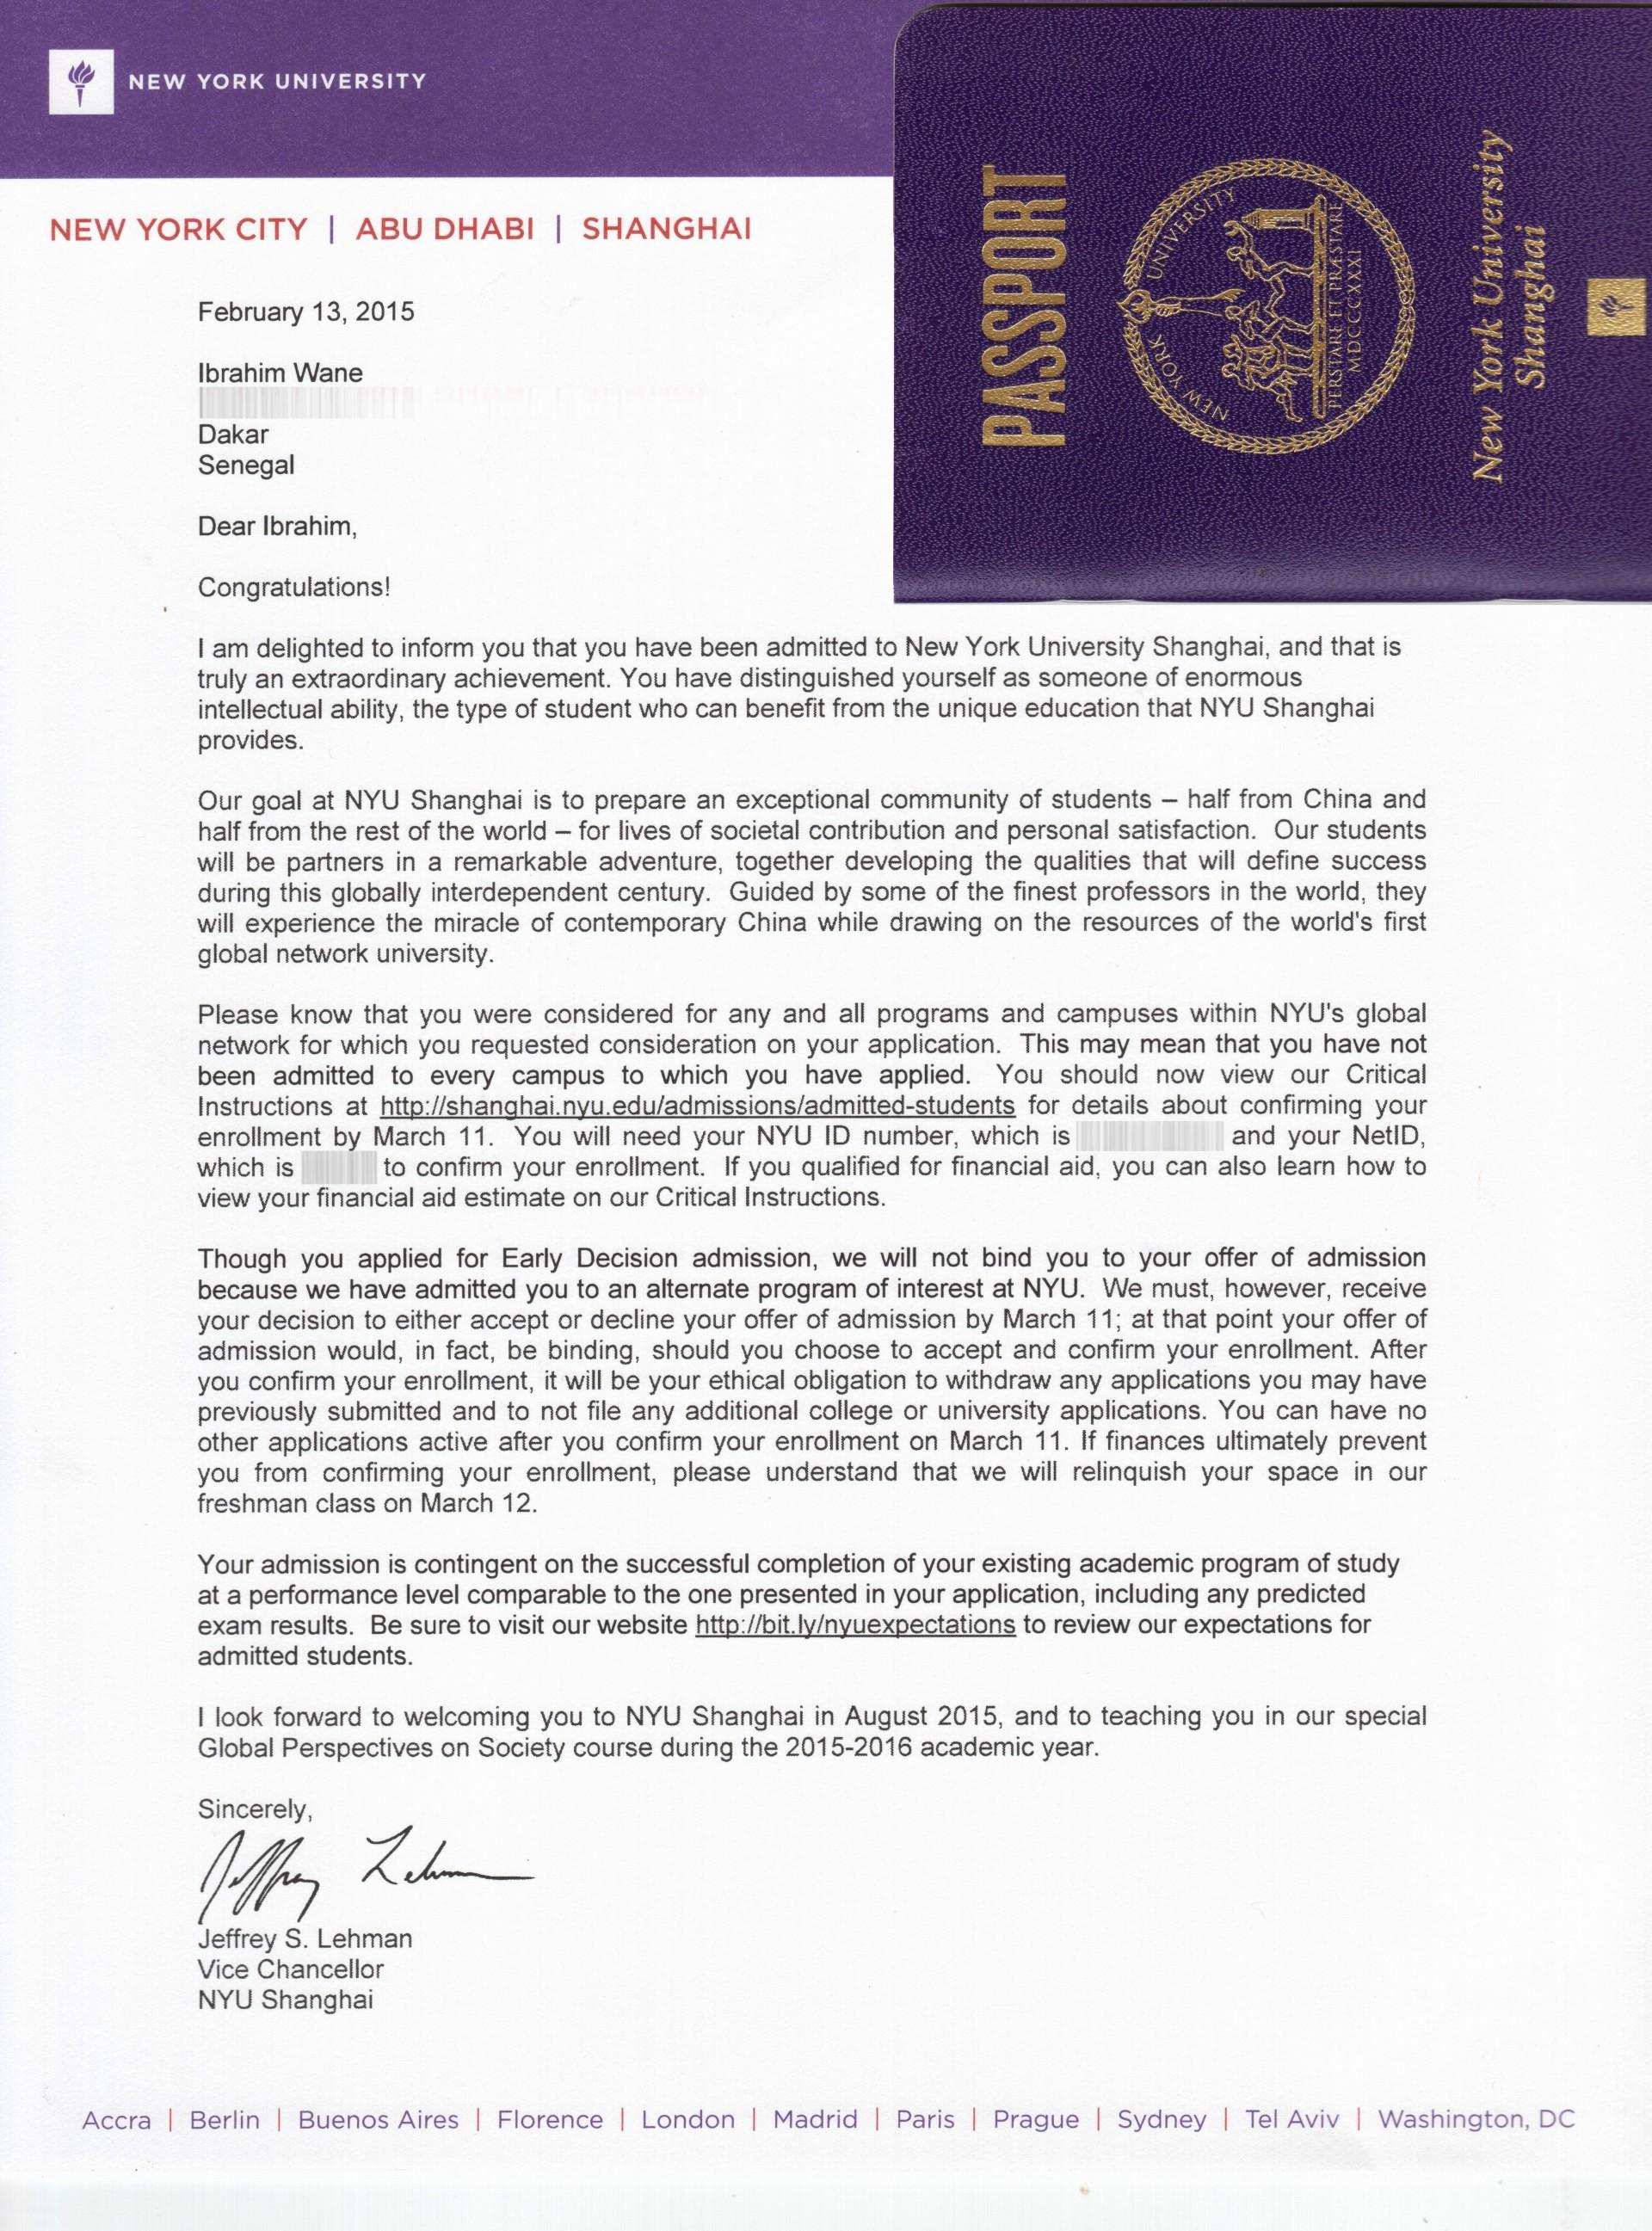 015 Nyush Acceptance Letter With Passport Blurred Why Nyu Essay Unforgettable 2018 Stern Reddit 1920